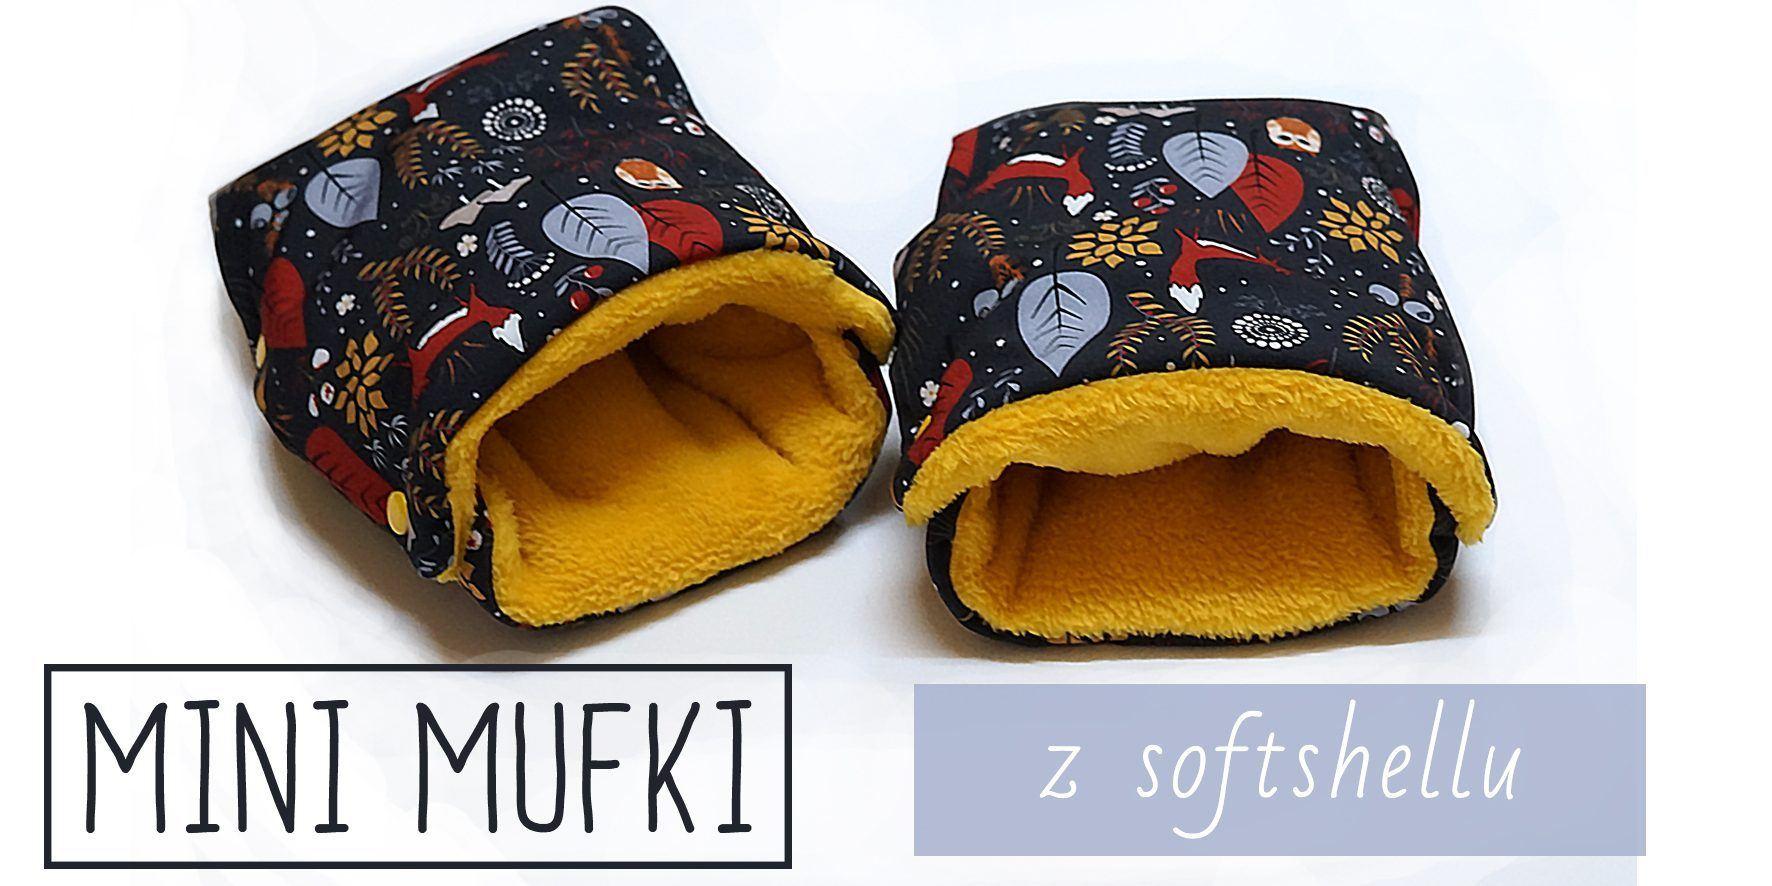 Mini mufki